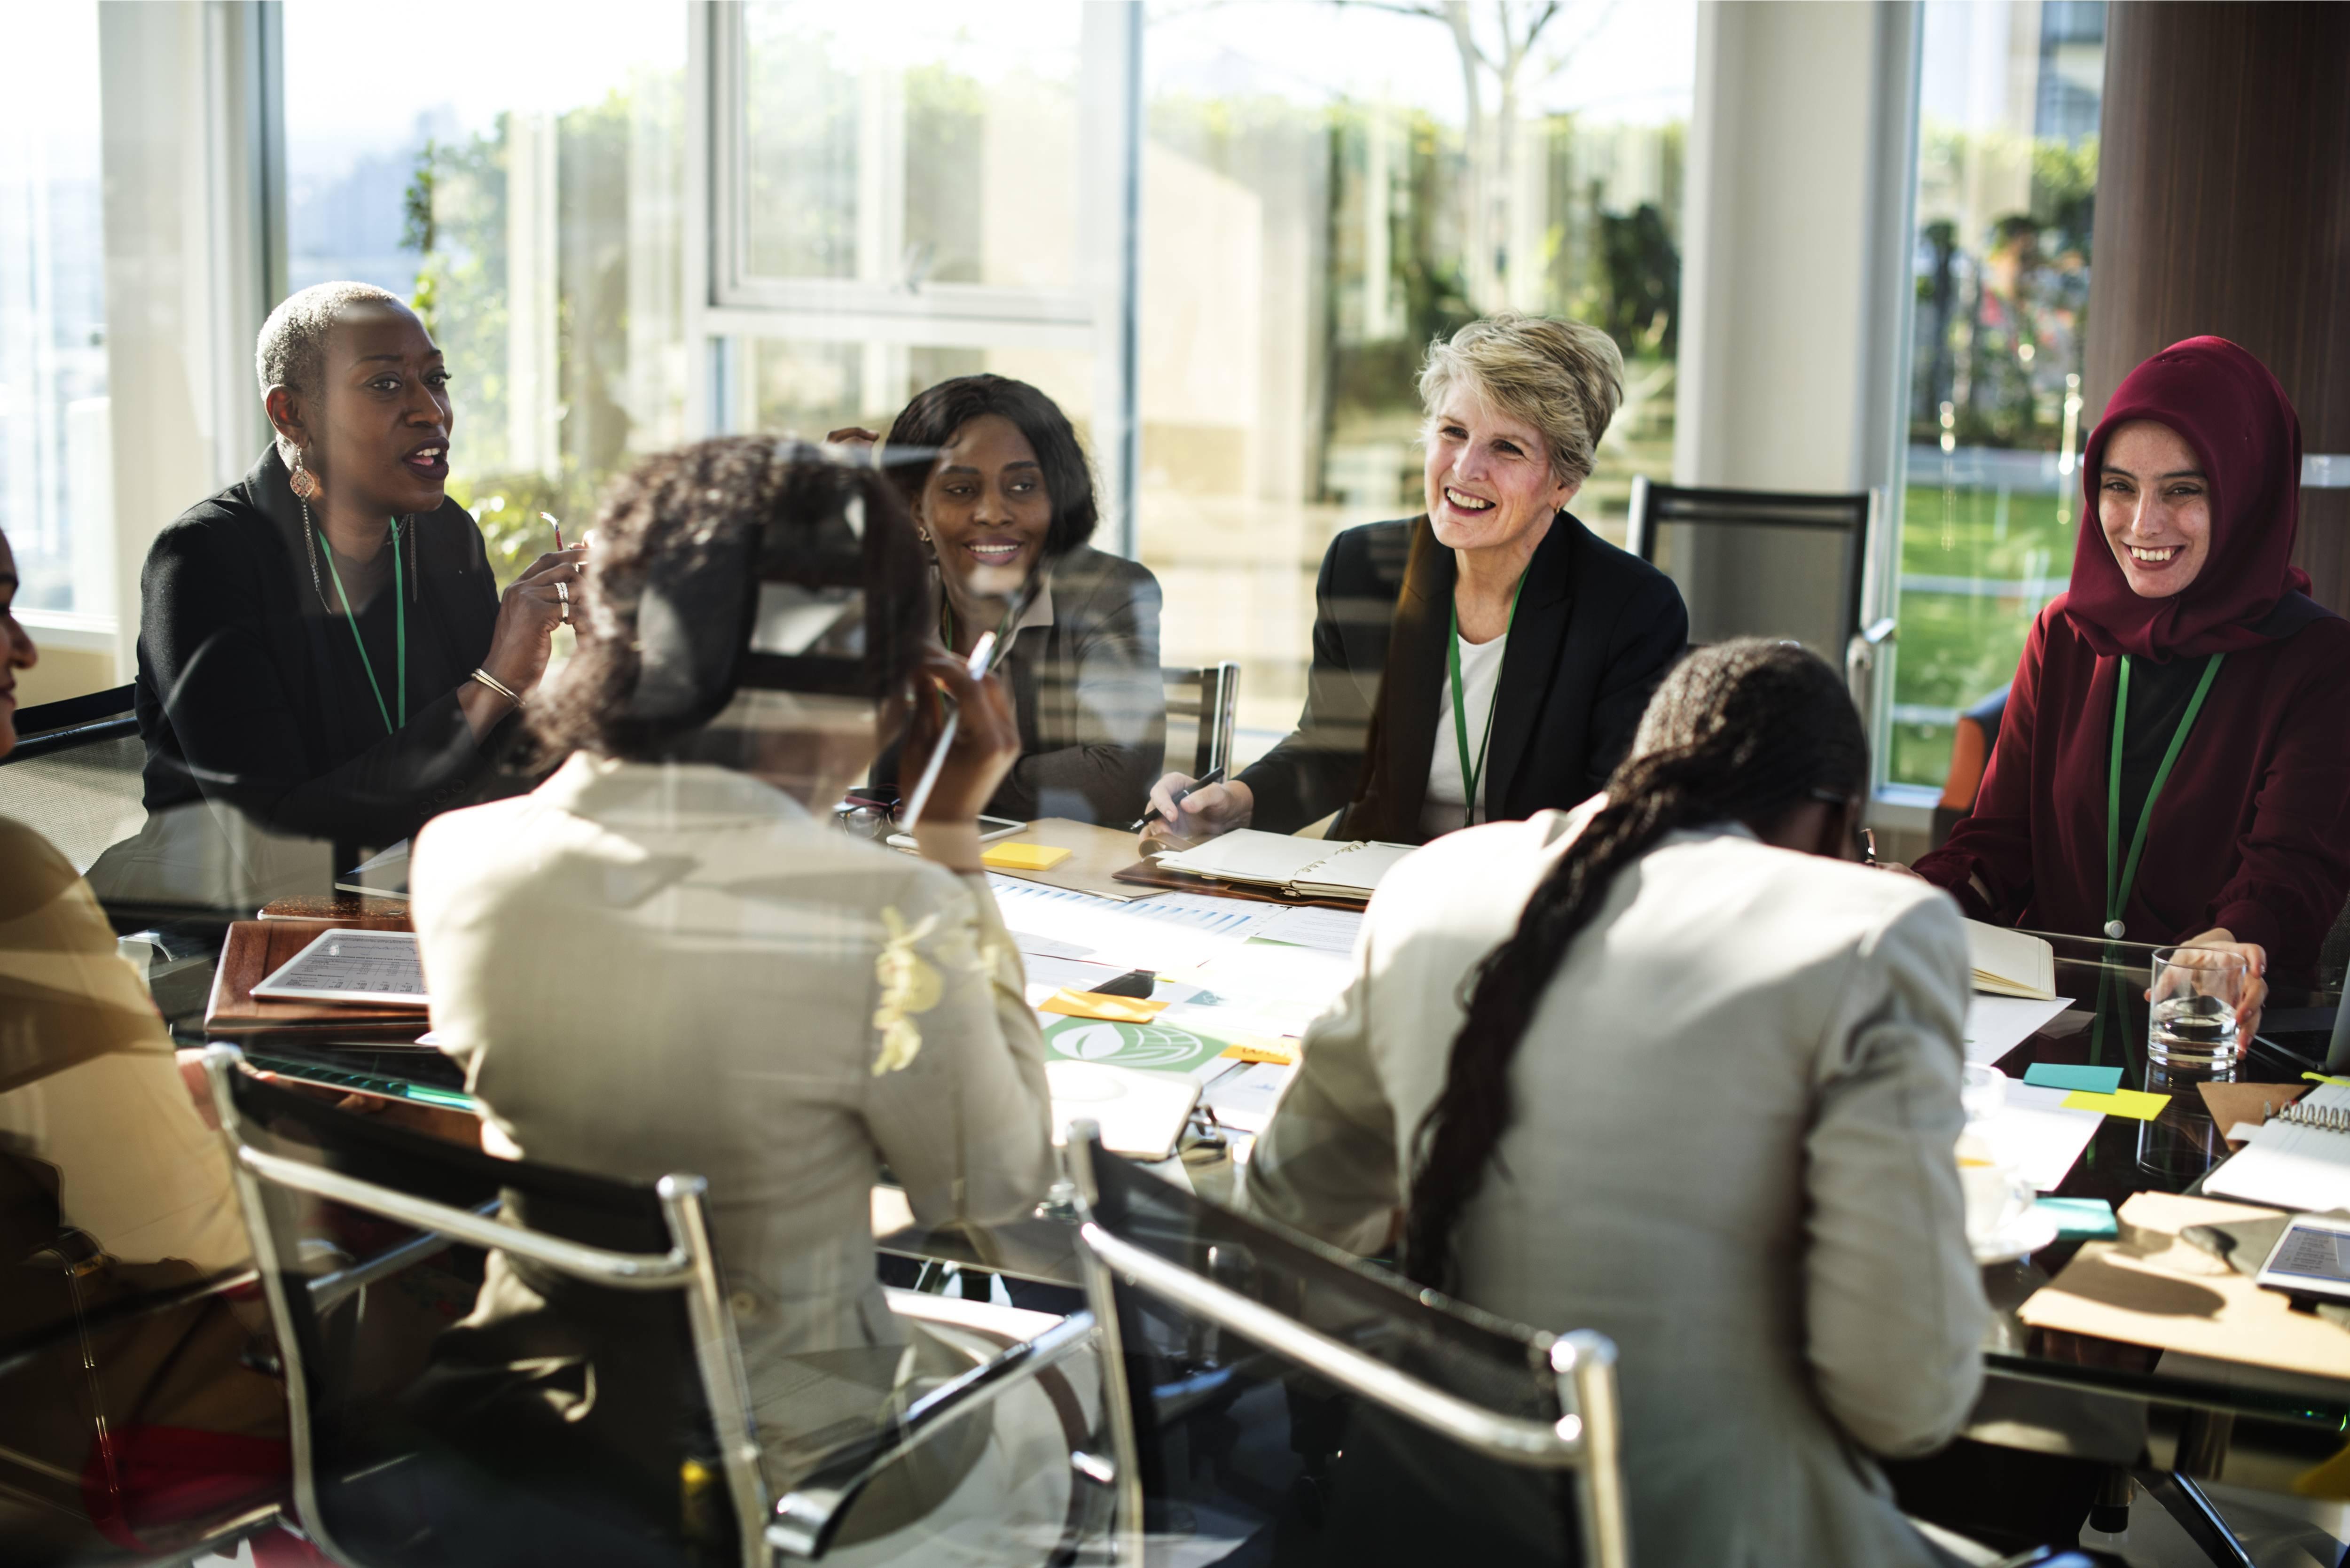 Diversity on a board room.jpeg